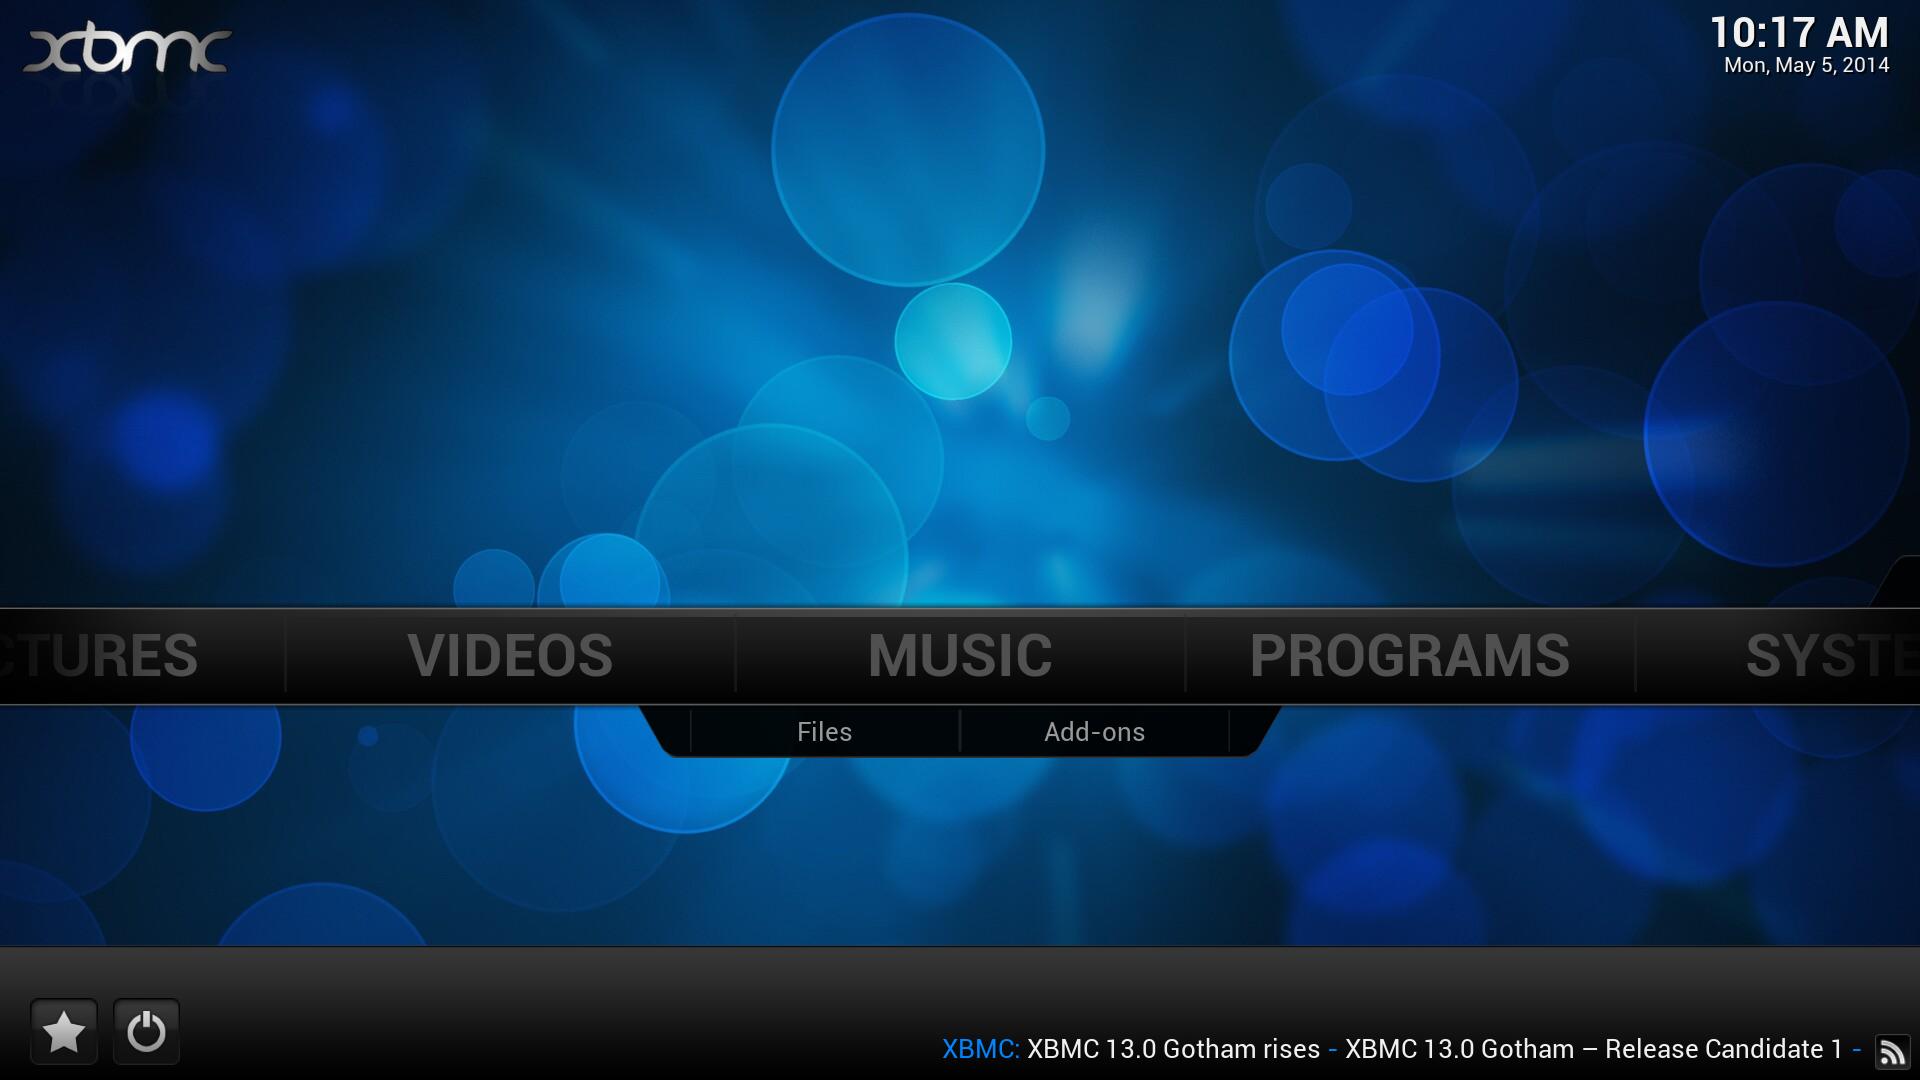 Vegas pro 9.0 demo download. flexi 8.5 software free download.